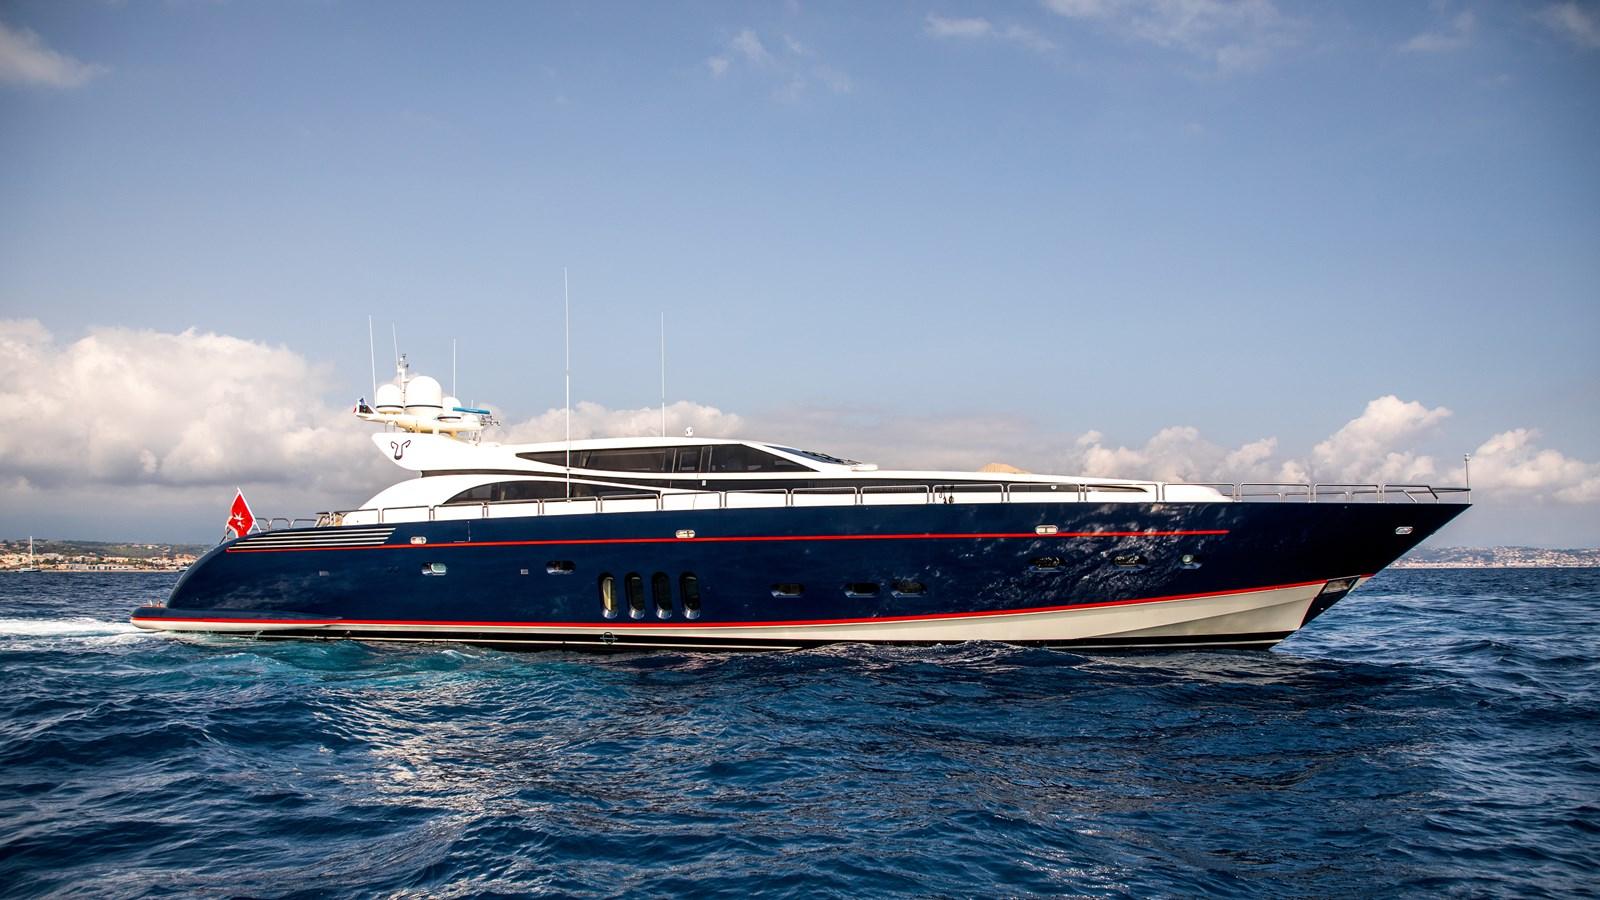 Cheeky-Tiger-Luxury-Yacht-26